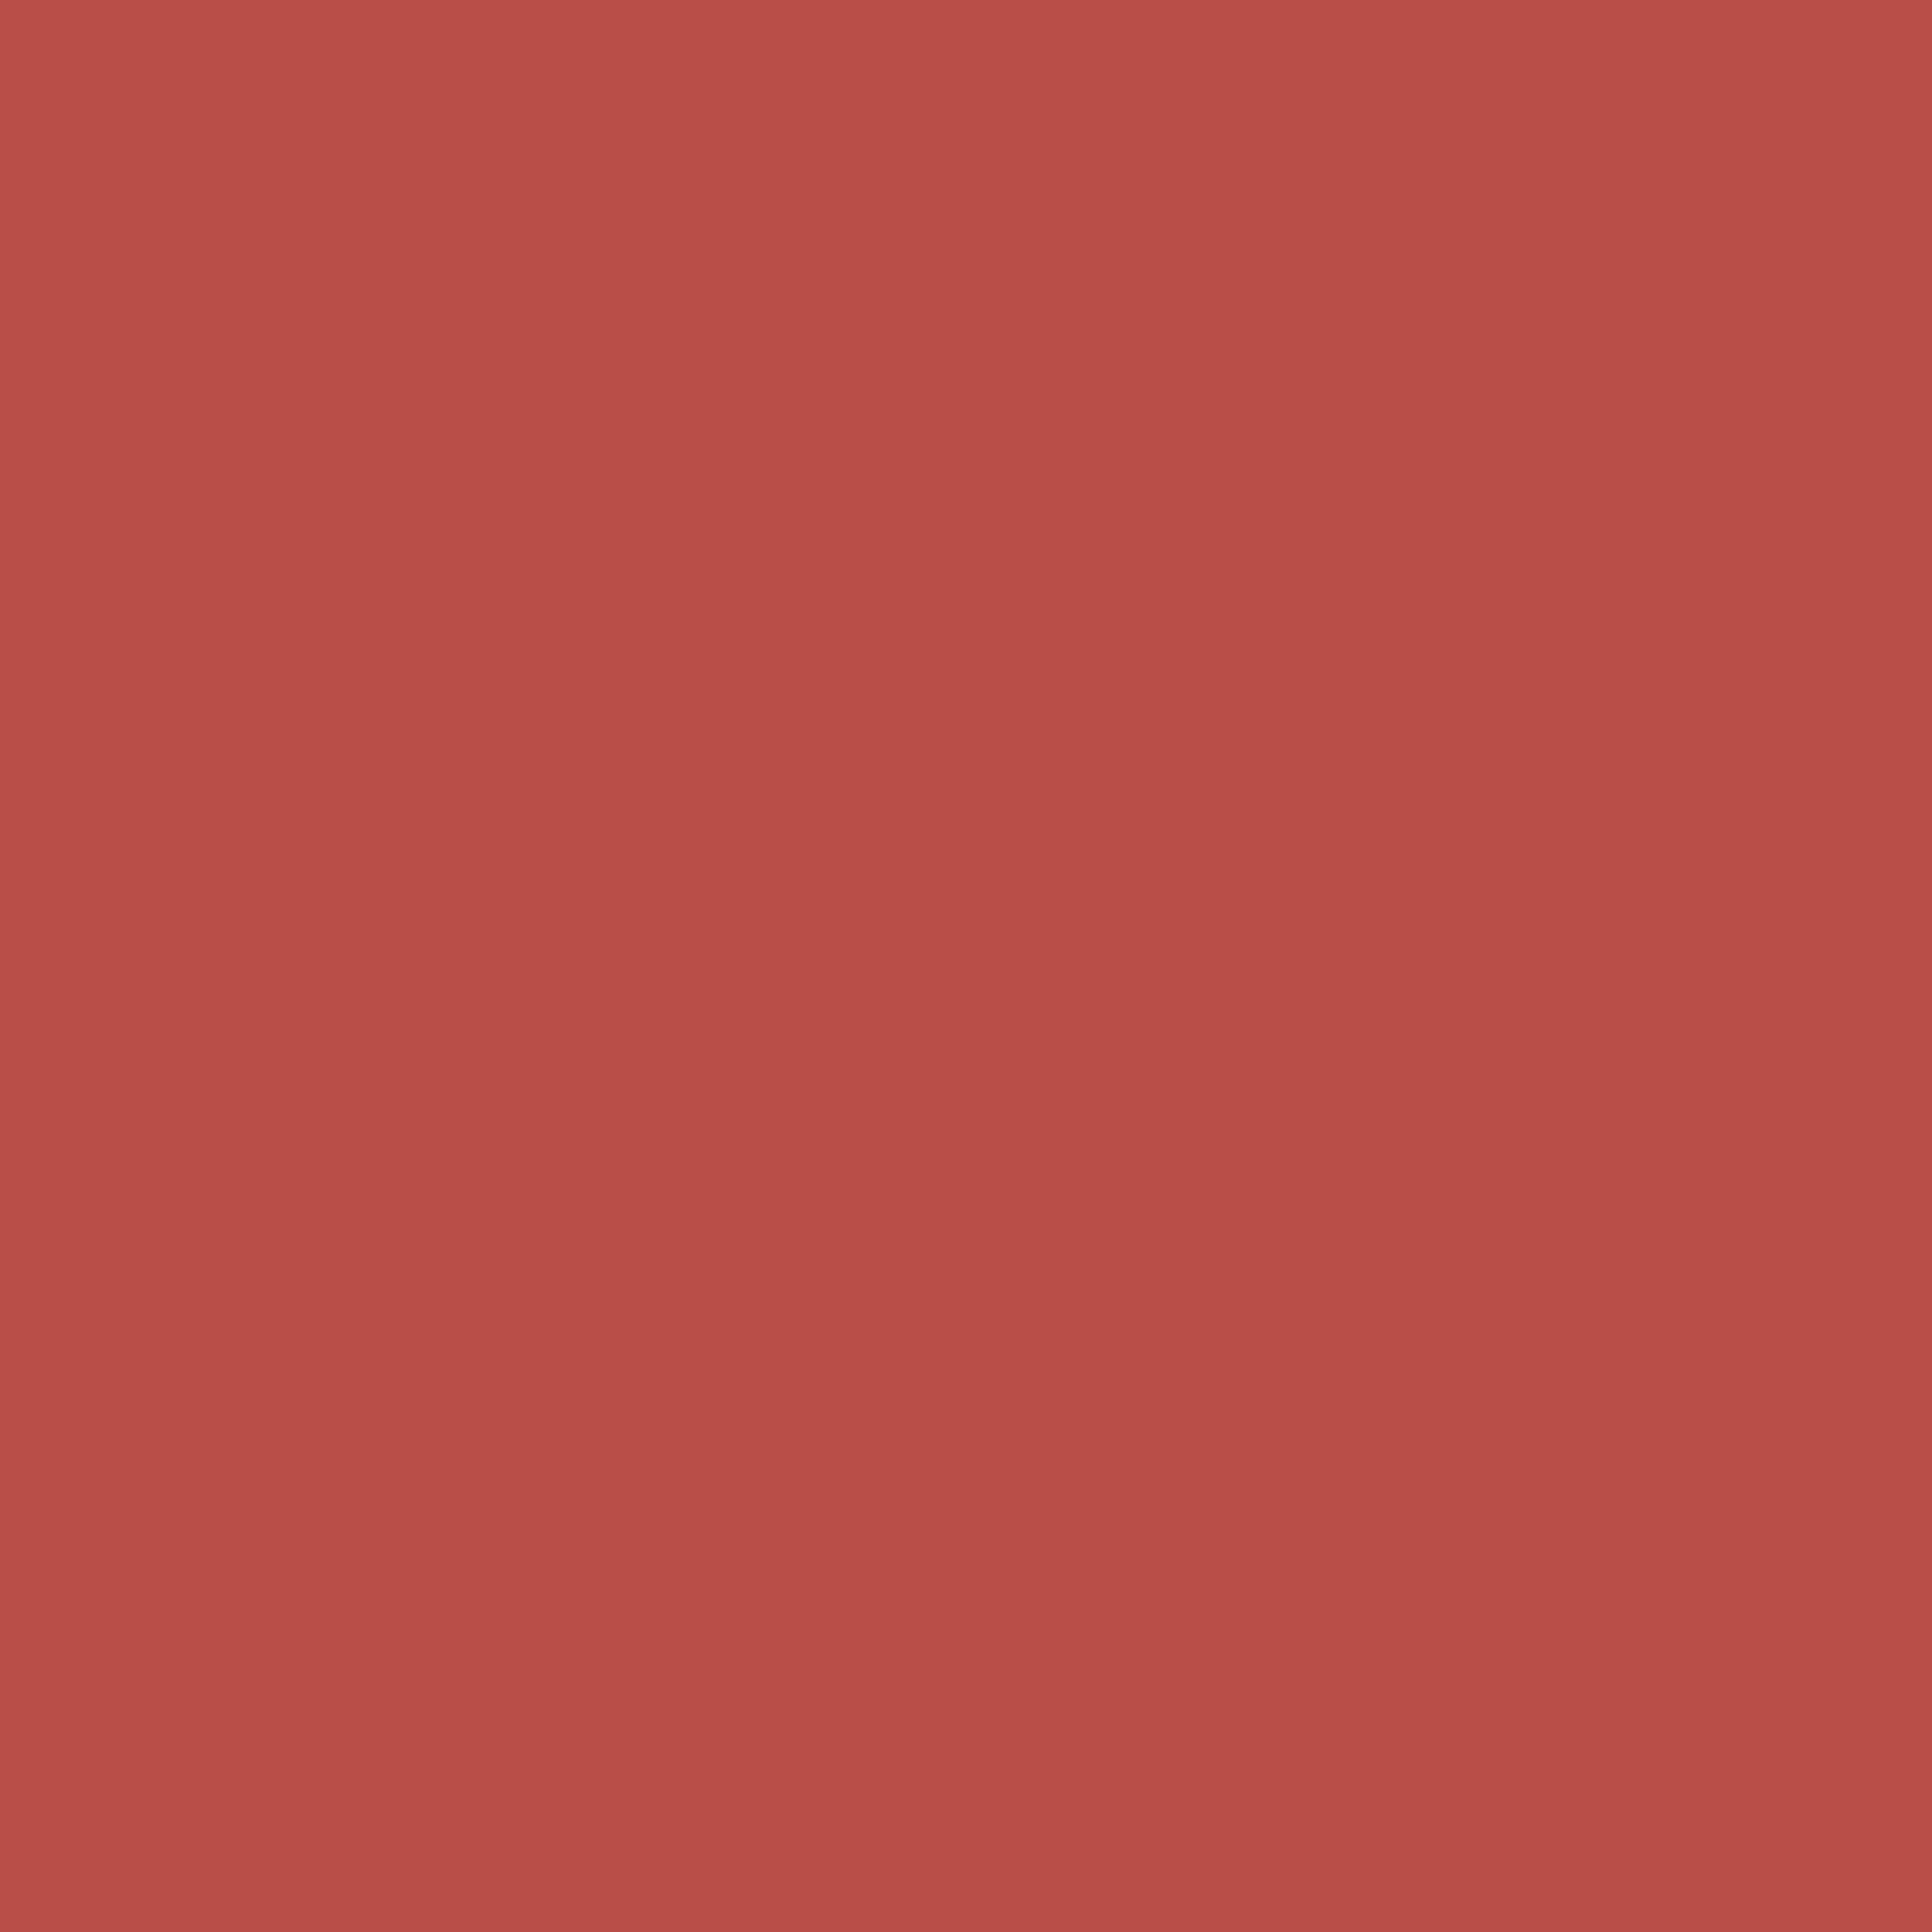 2048x2048 Deep Chestnut Solid Color Background